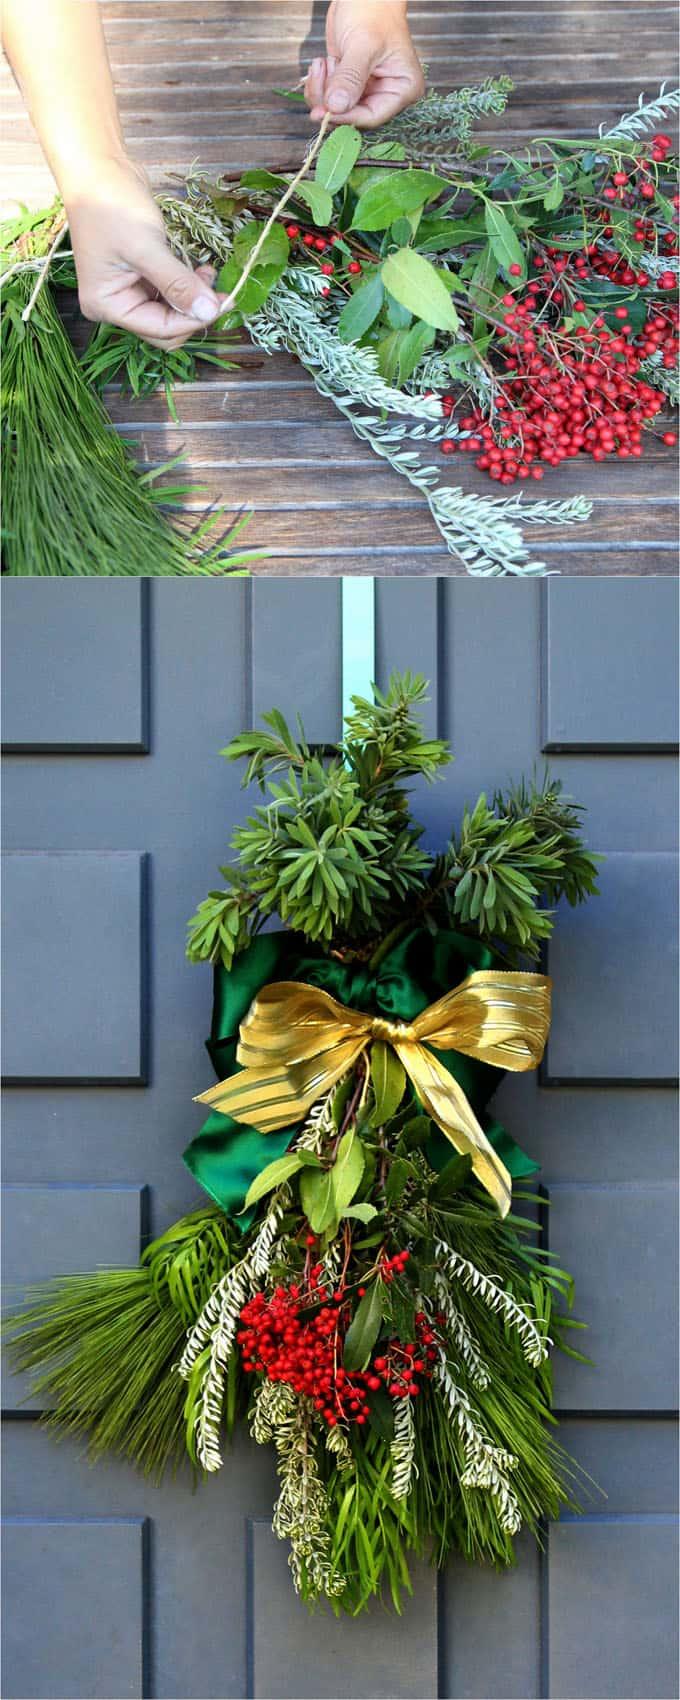 easy DIY Christmas swag apieceofrainbowblog 2 - The Easiest DIY Christmas Swag Ever